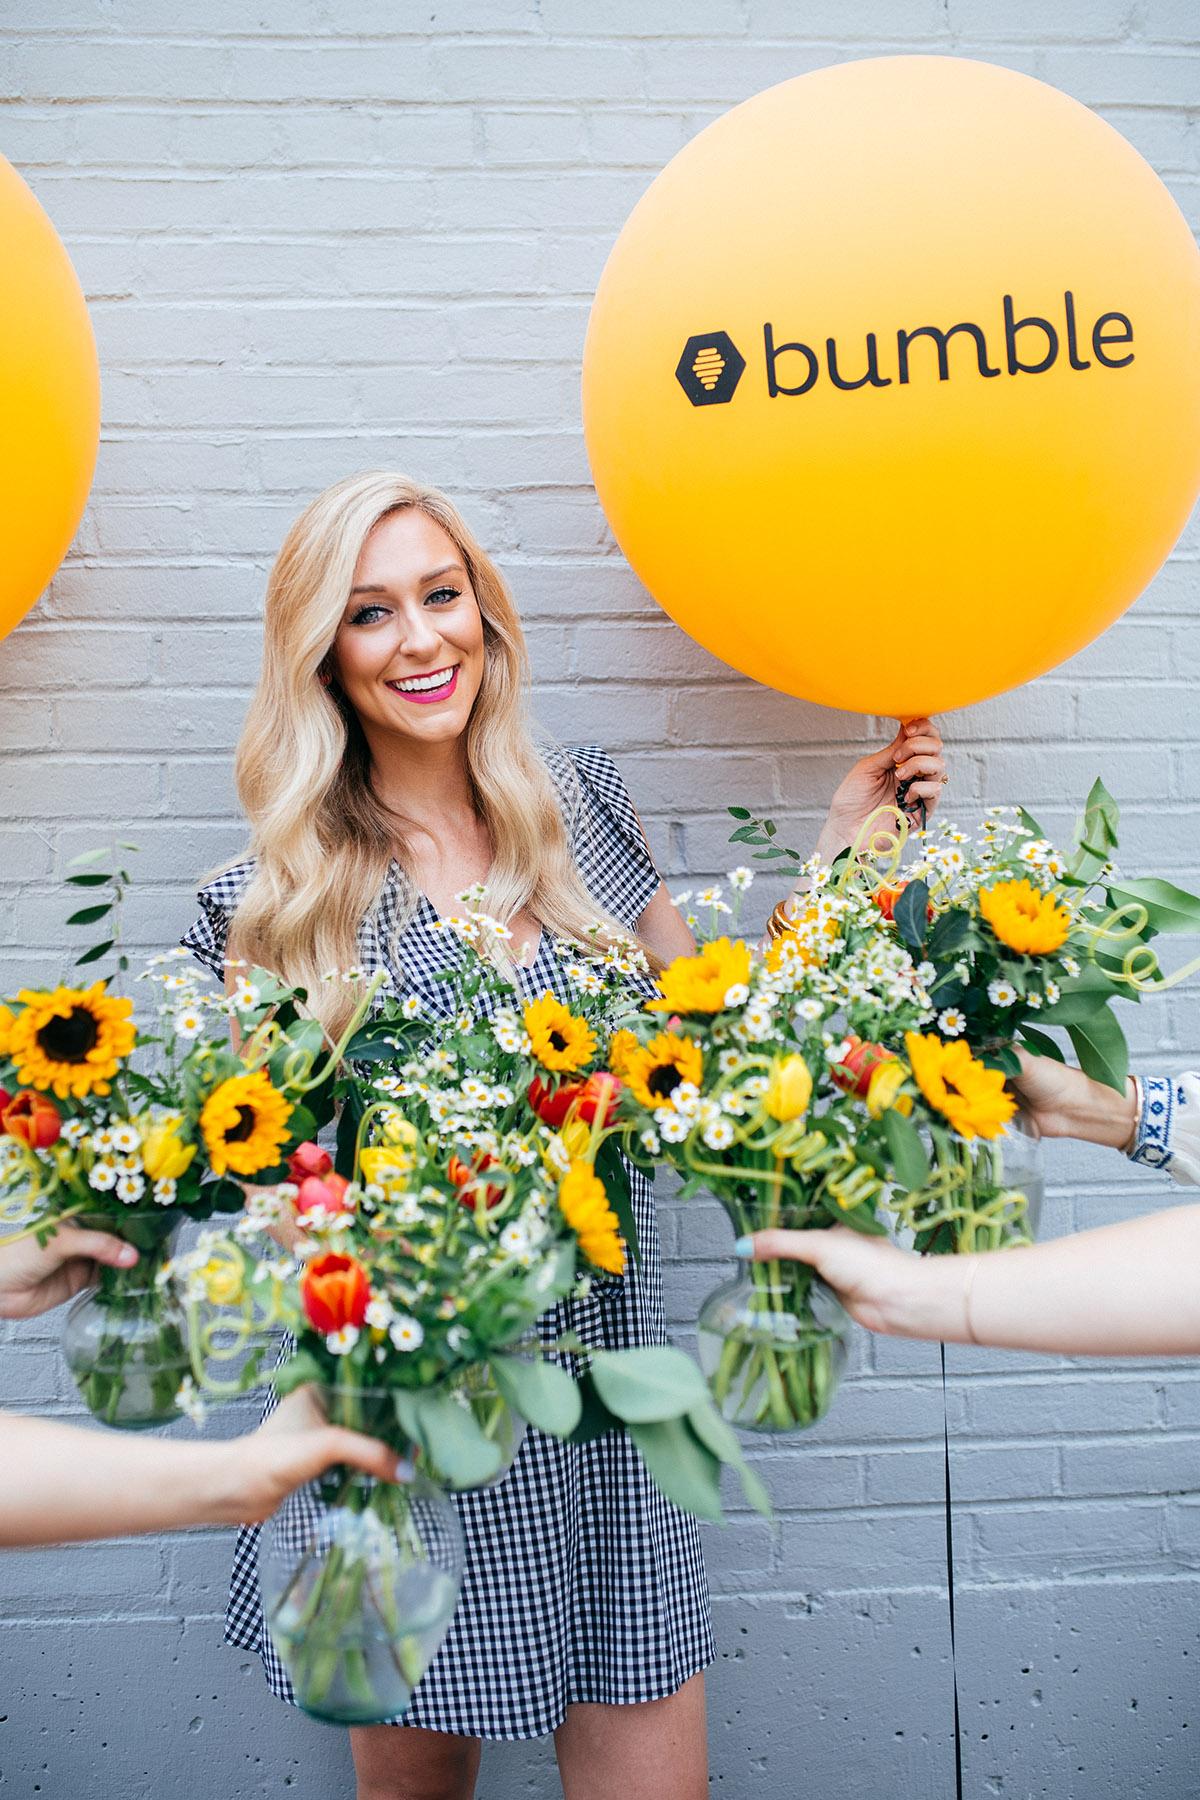 Floral Arranging Brunch | How To Plan A BumbleBFF Meet Up